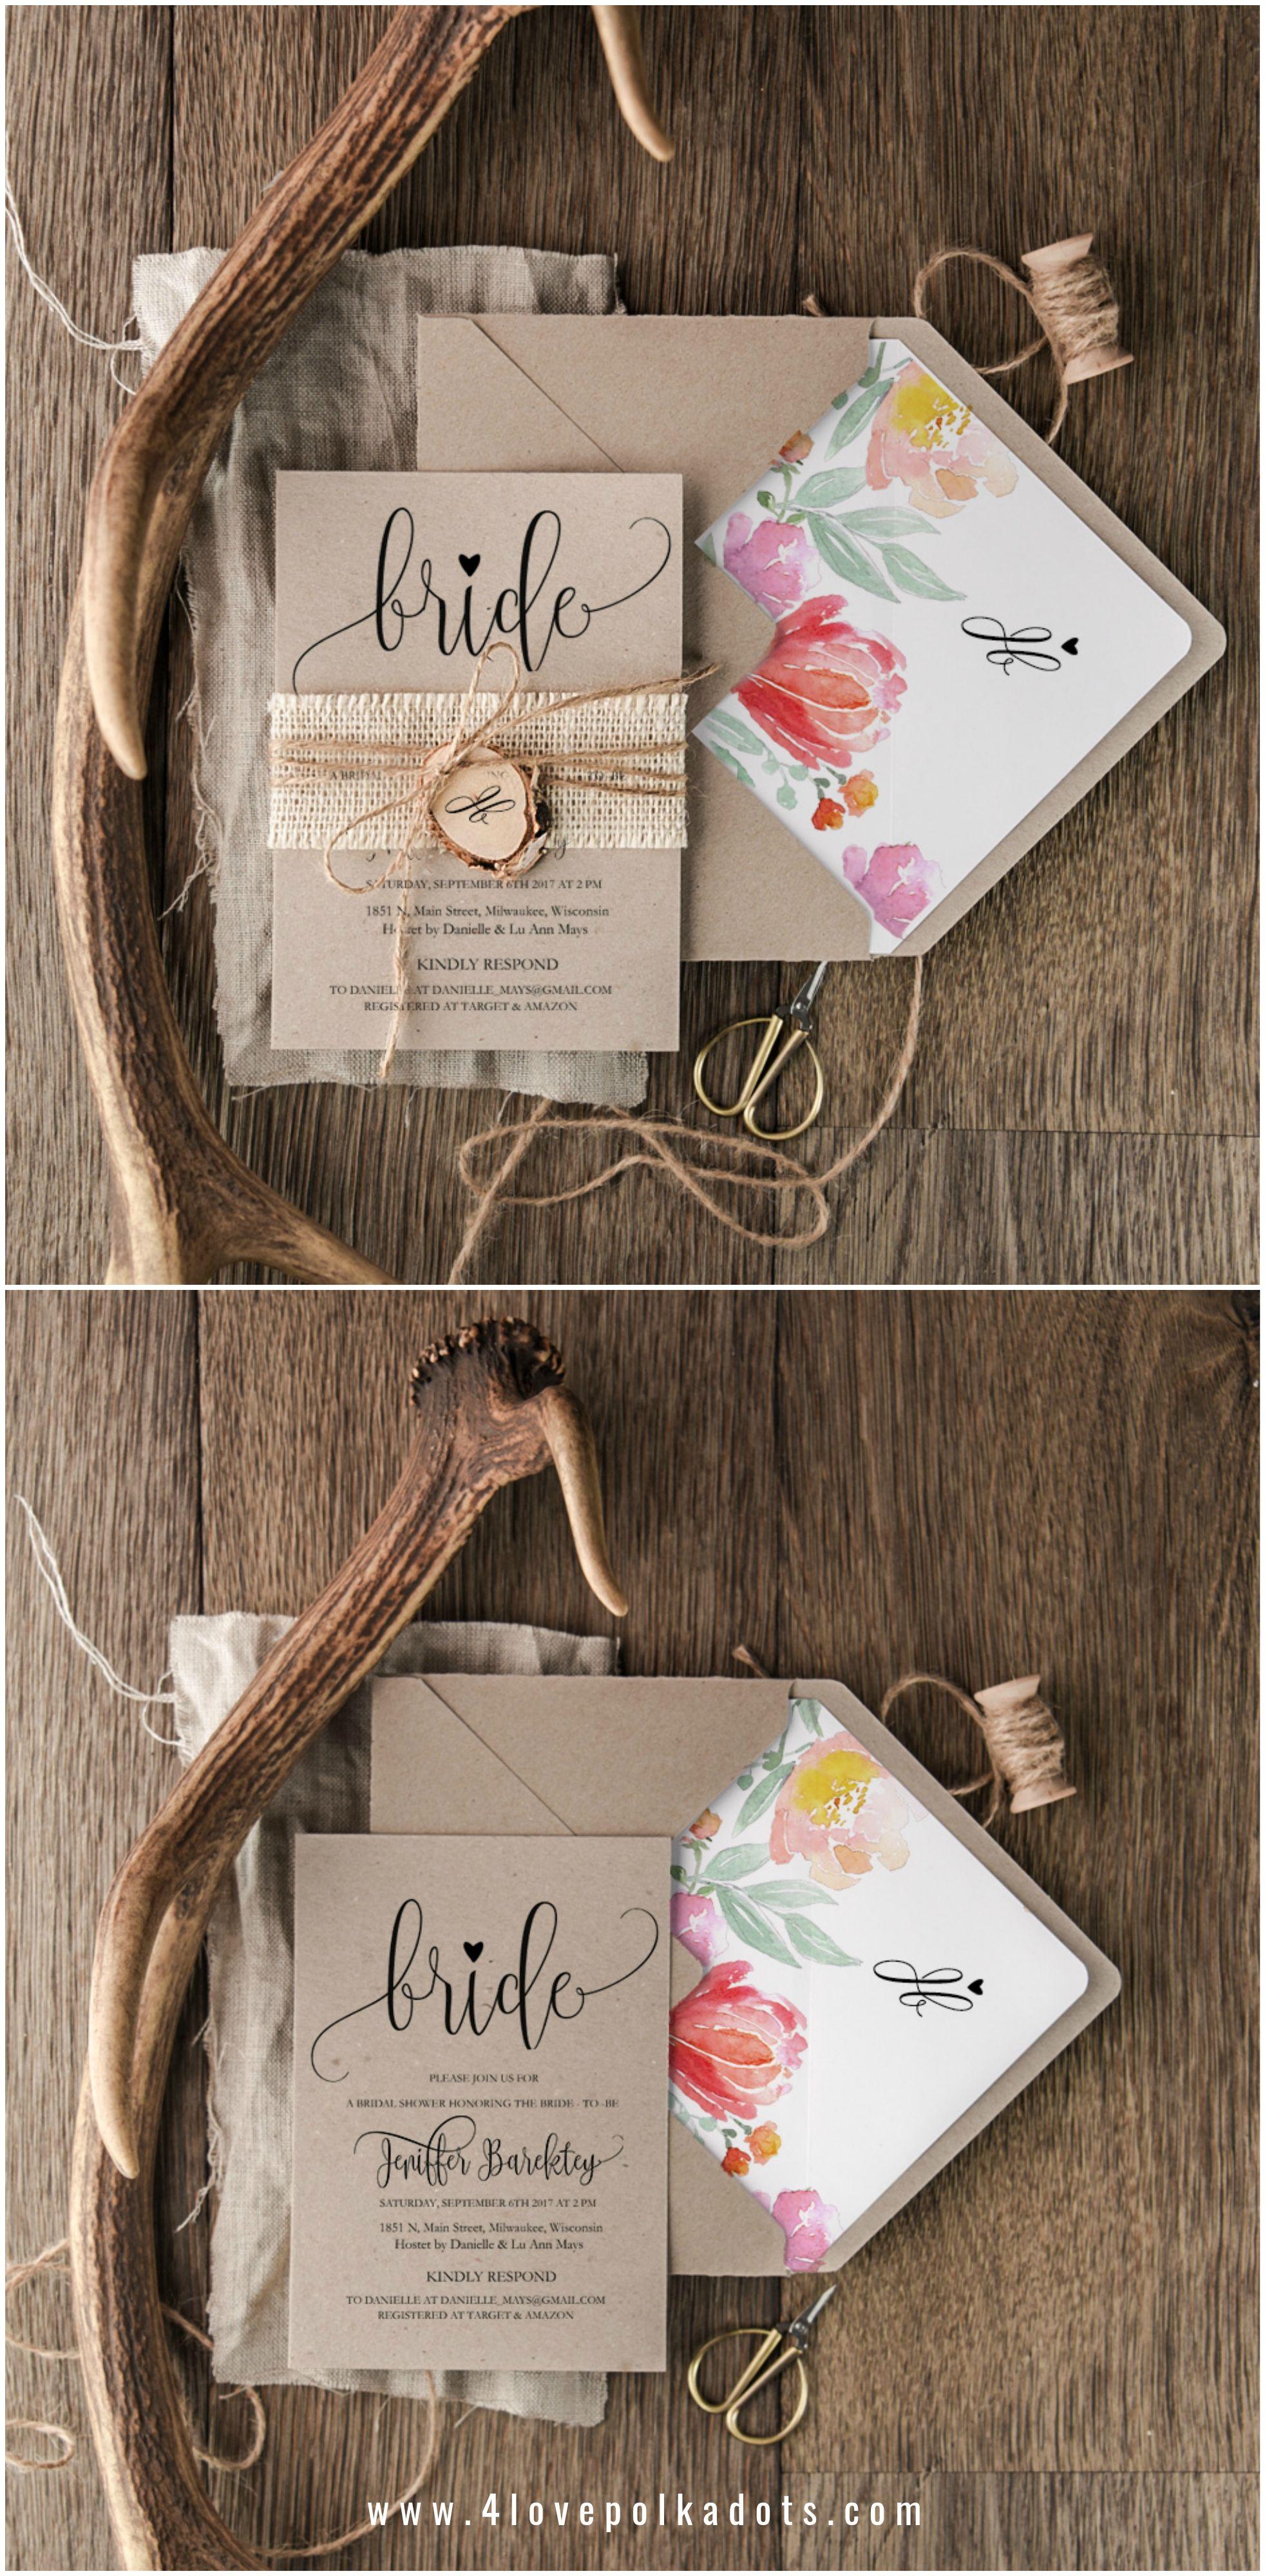 bb79808dbd7c Bridal Shower Invitations with wooden tag  bride  bridetobe   bridalshowertea  wedding  rustic  floral  colorful